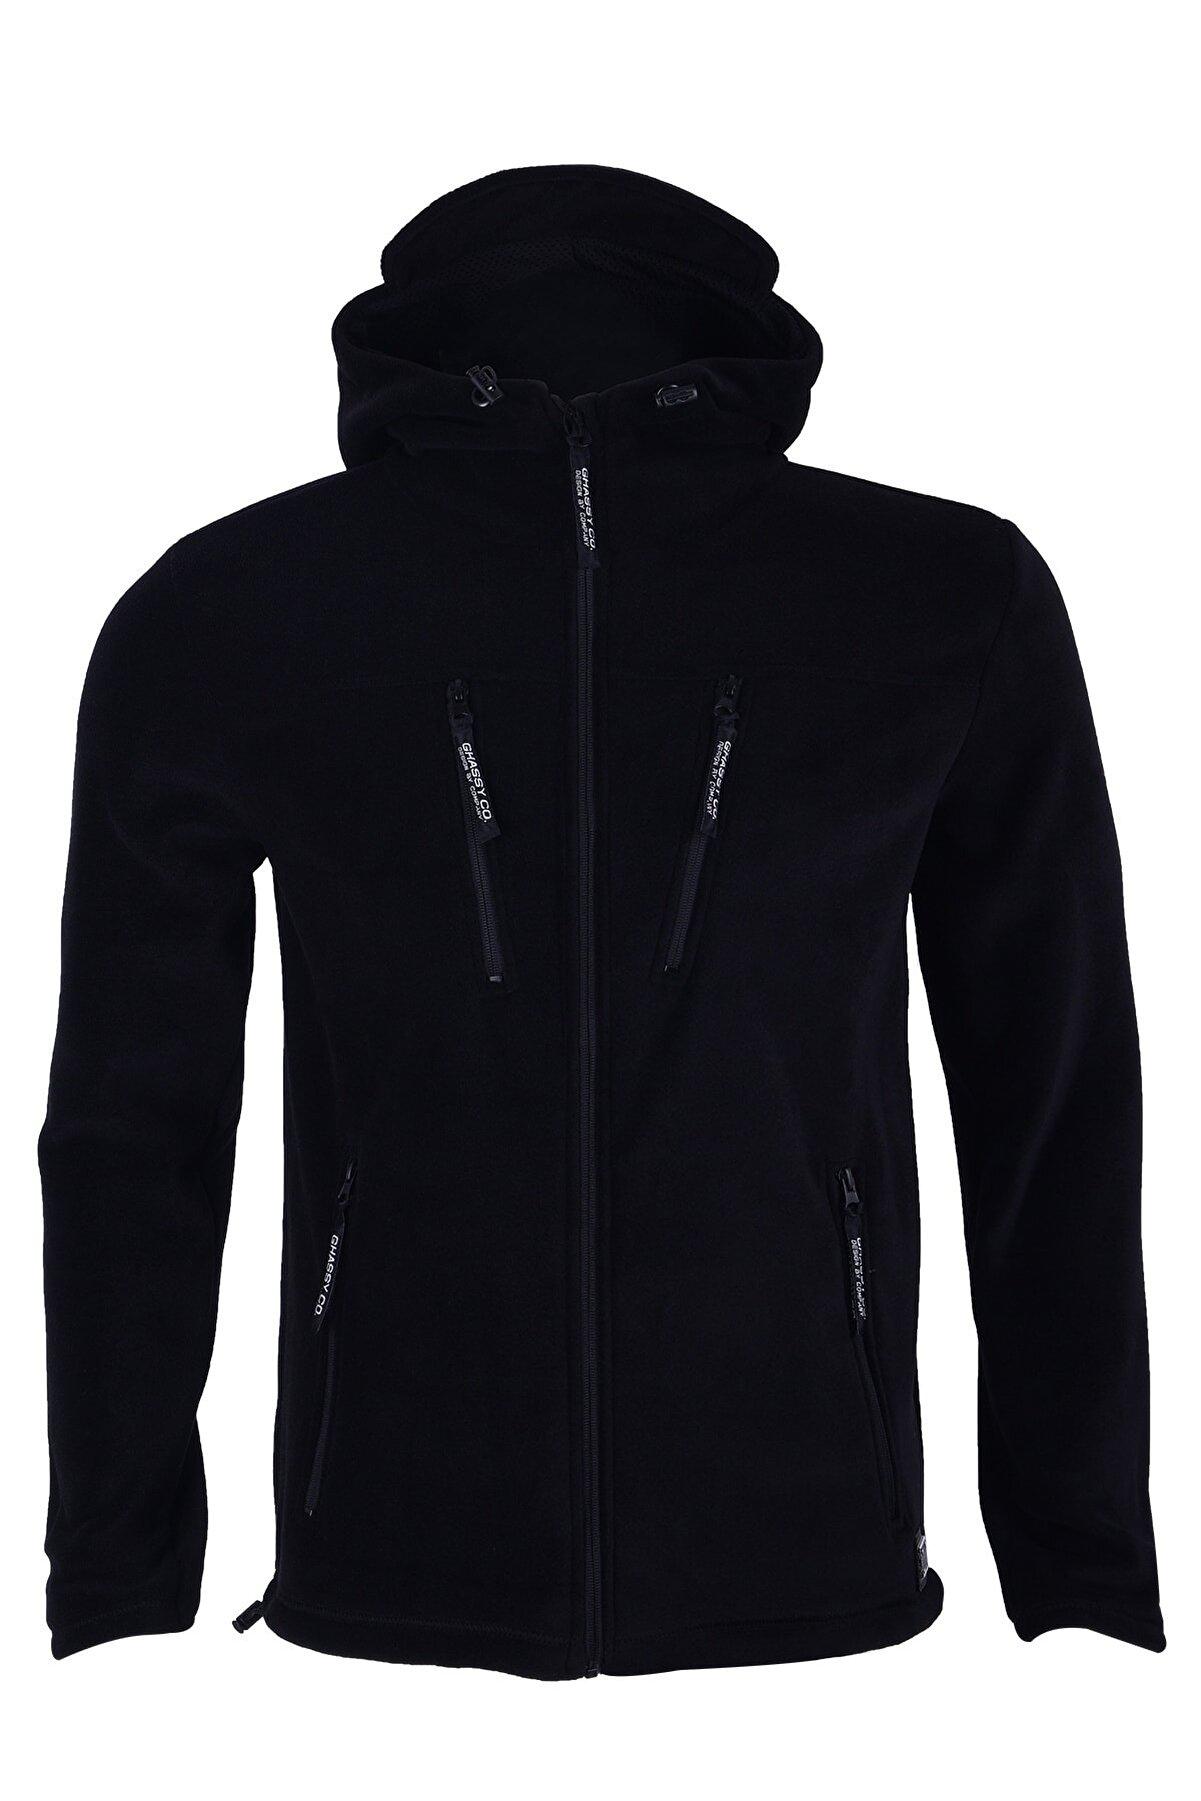 Ghassy Co Erkek Siyah Army Tactical Kapüşonlu Outdoor Polar Ceket